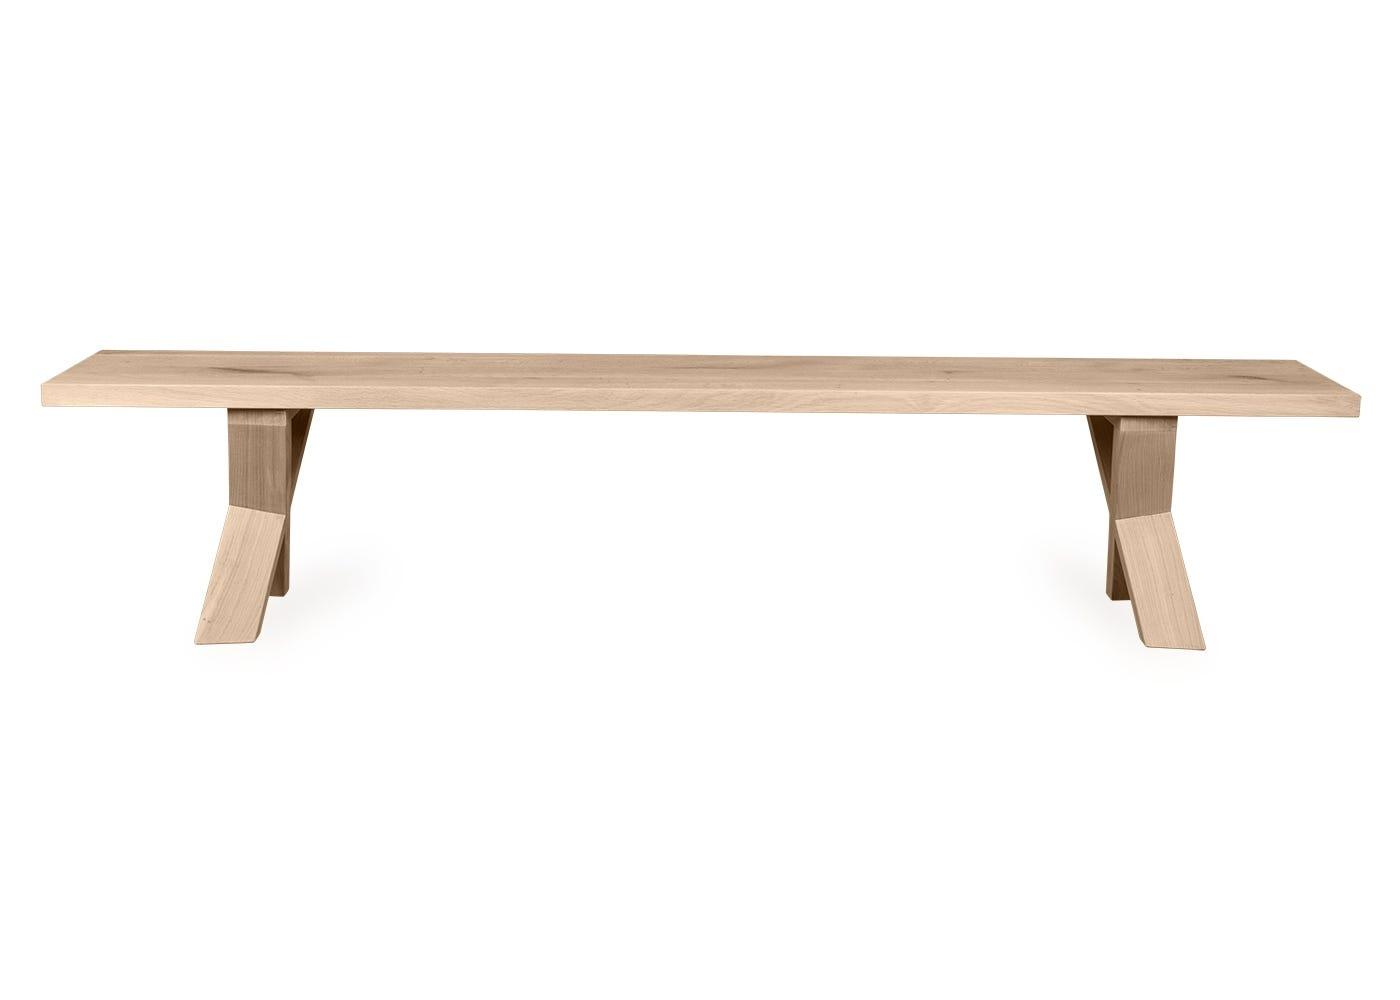 Oslo bench in white oak with a straight edge profile.